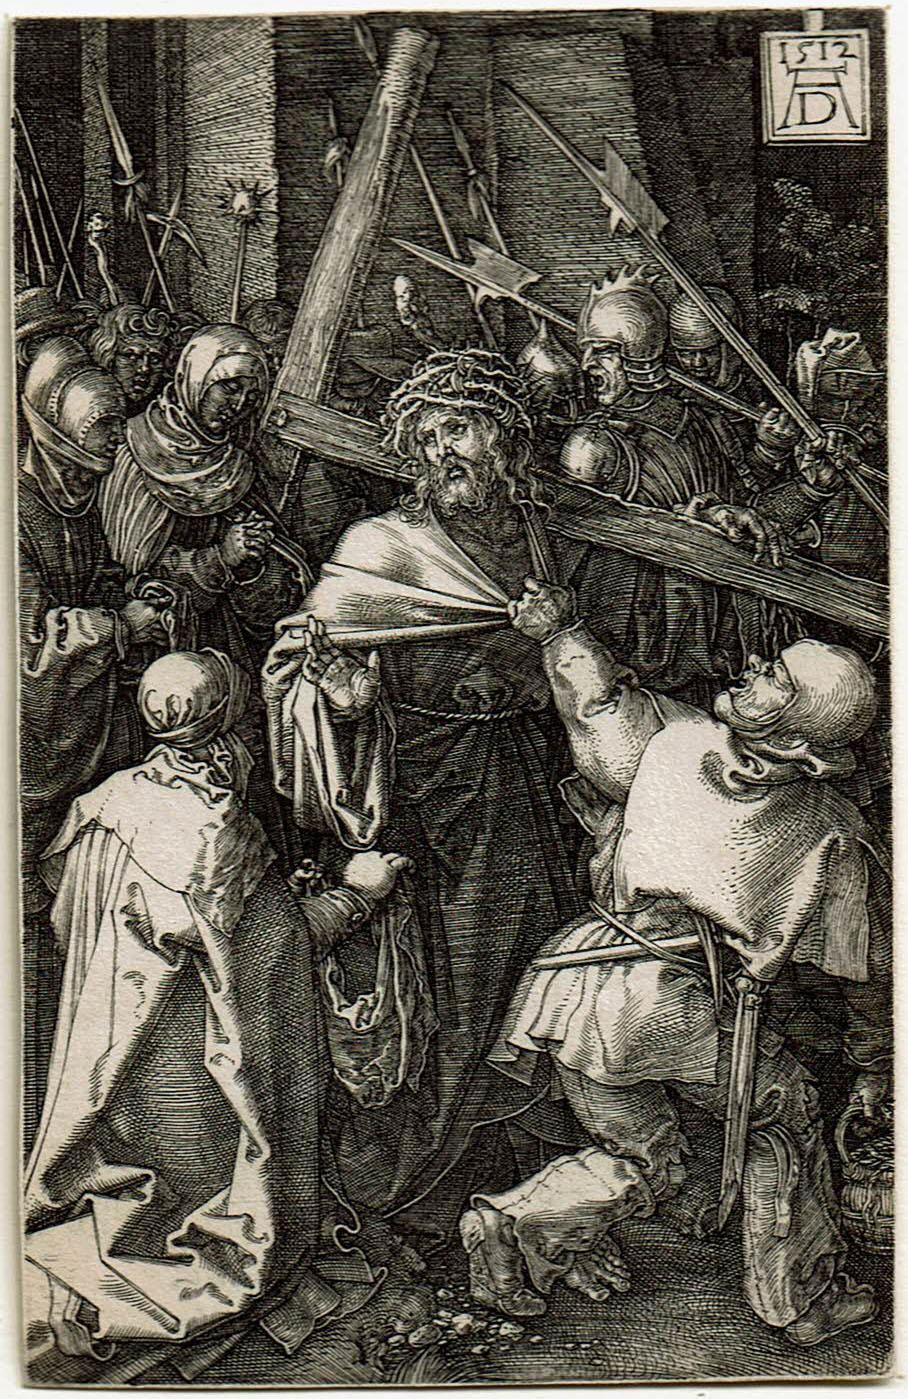 Albrecht Dürer (1471-1528), <em>Christ Carrying the Cross</em> from the Egraved Passion series, 1512 Krannert Art Museum, University of Illinois, Urbana-Champaign